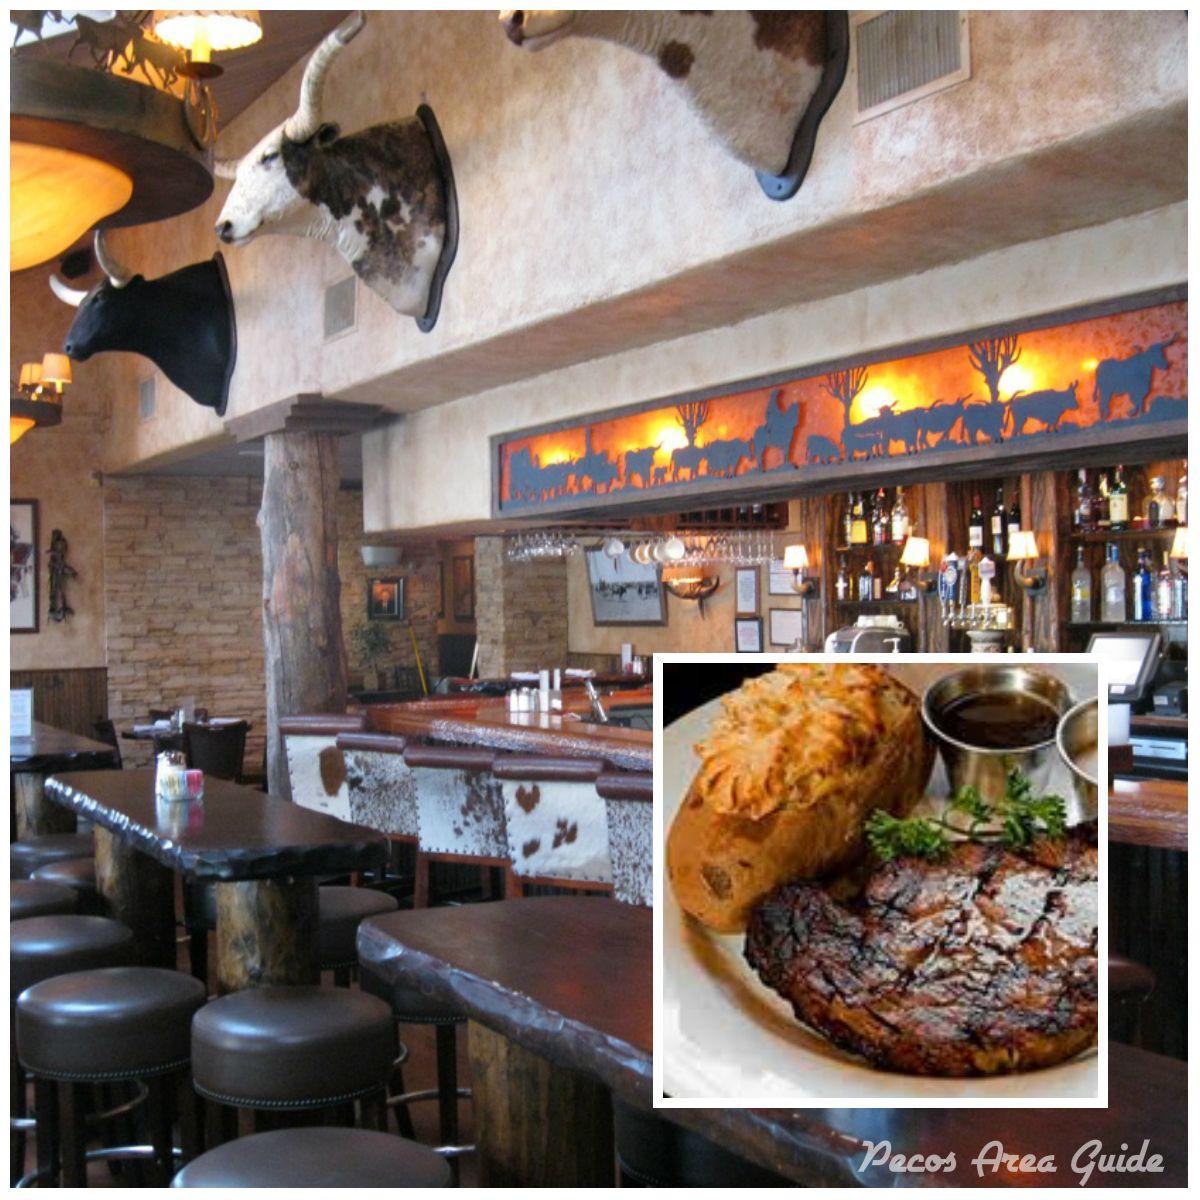 Wedding Invitations El Paso Tx: The Cattle Baron Corporation Has Restaurants In Portales